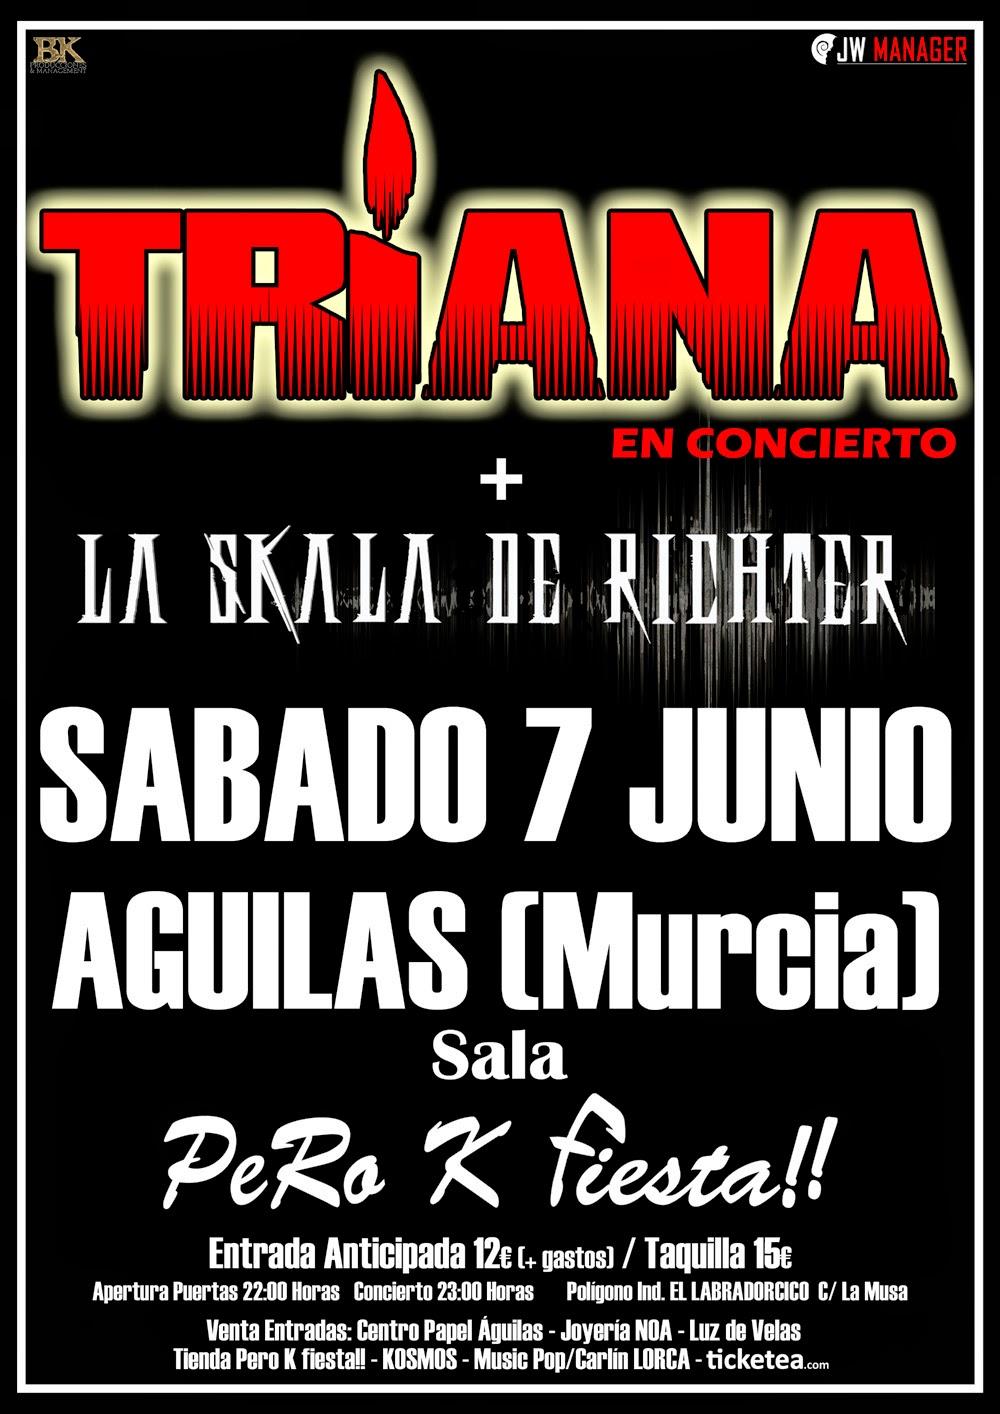 SÁBADO 7 JUNIO 2014 SALA PERO K FIESTA!! ÁGUILAS (Murcia)